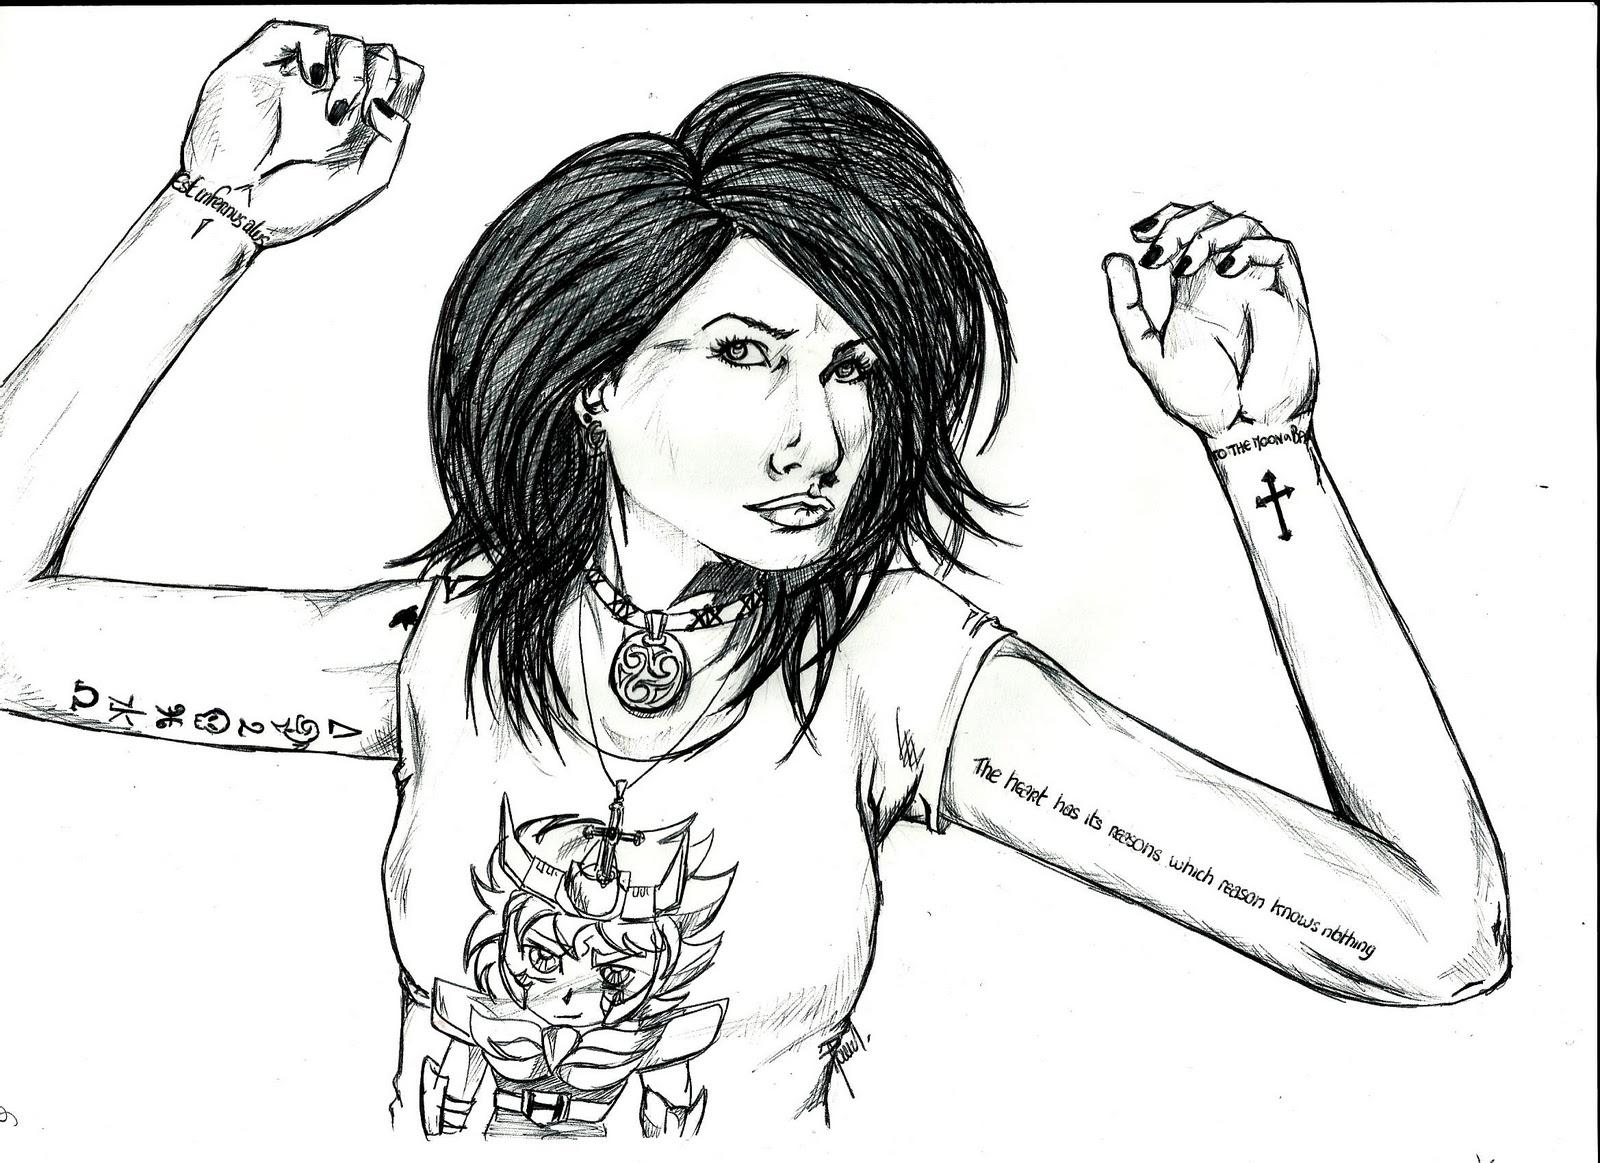 http://2.bp.blogspot.com/-uOSNaaTw6LQ/Tn7pLW_-hGI/AAAAAAAACMg/KovJ4mXYK3I/s1600/tatoo.jpg